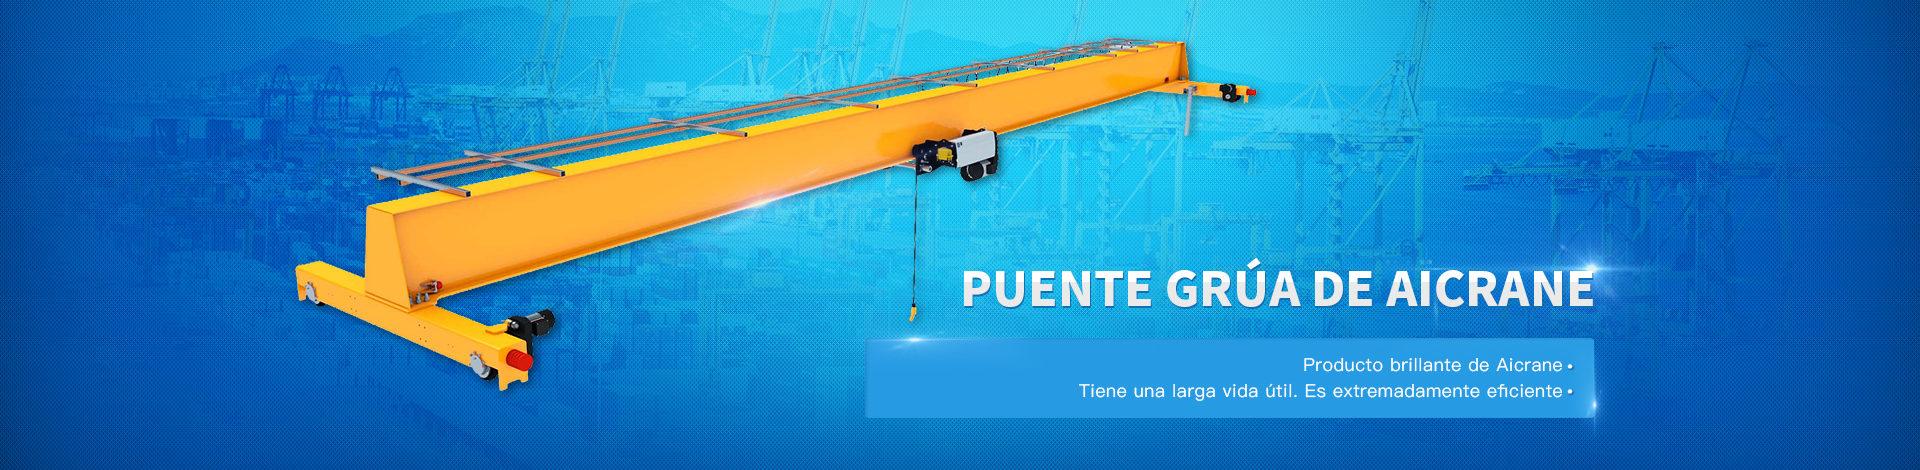 Grúa De Puente De Aicrane Grupo